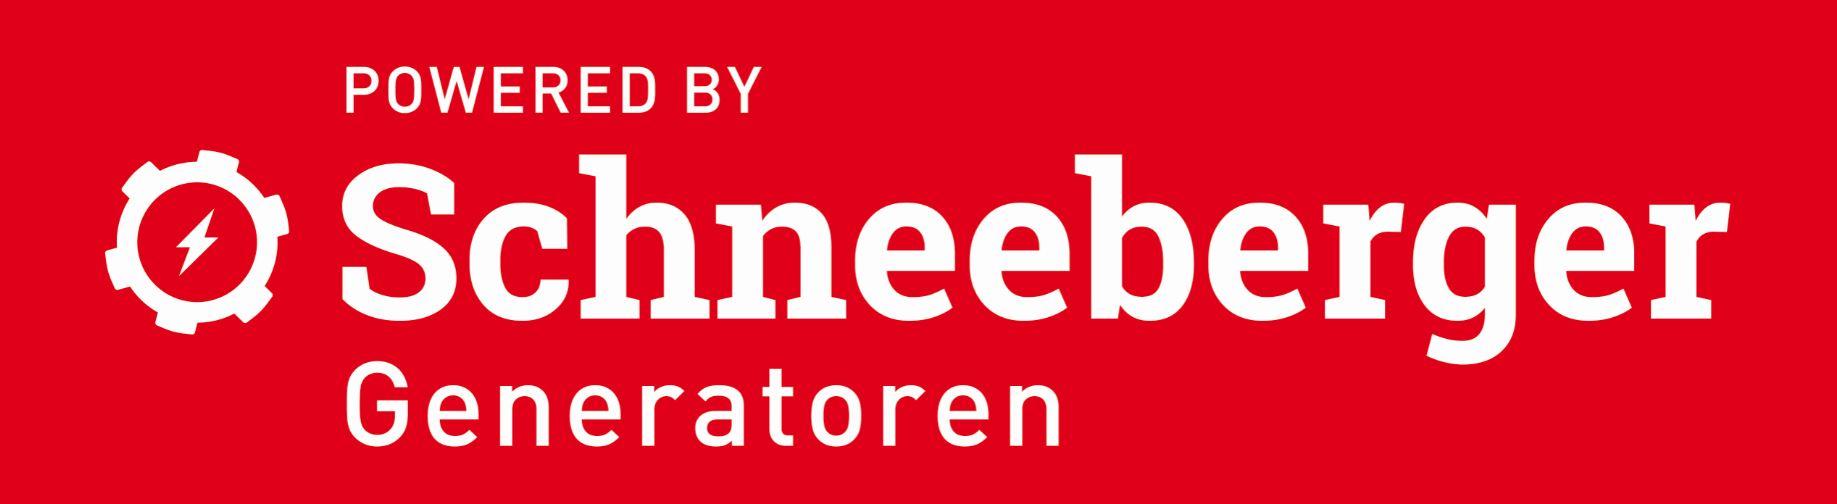 logo Schneeberger.JPG